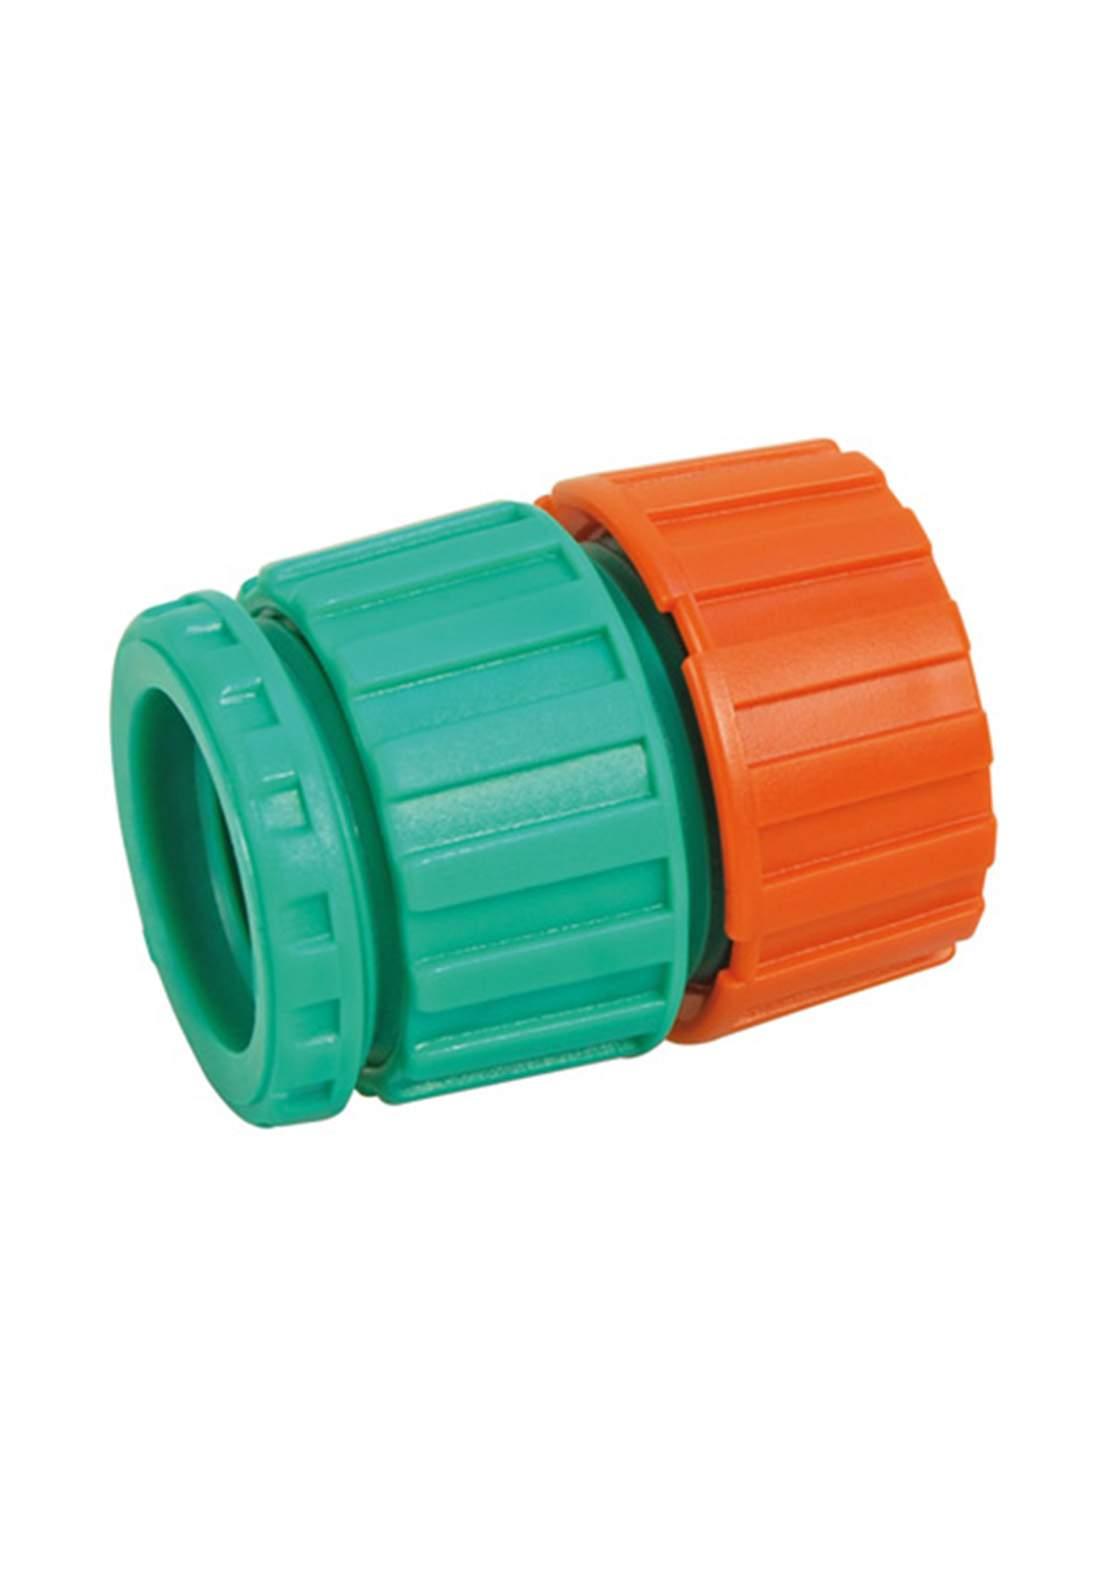 Tramontina 78513/000 Hose Adapter Thread Pattern 1/2 inch وصلة خرطوم المياه